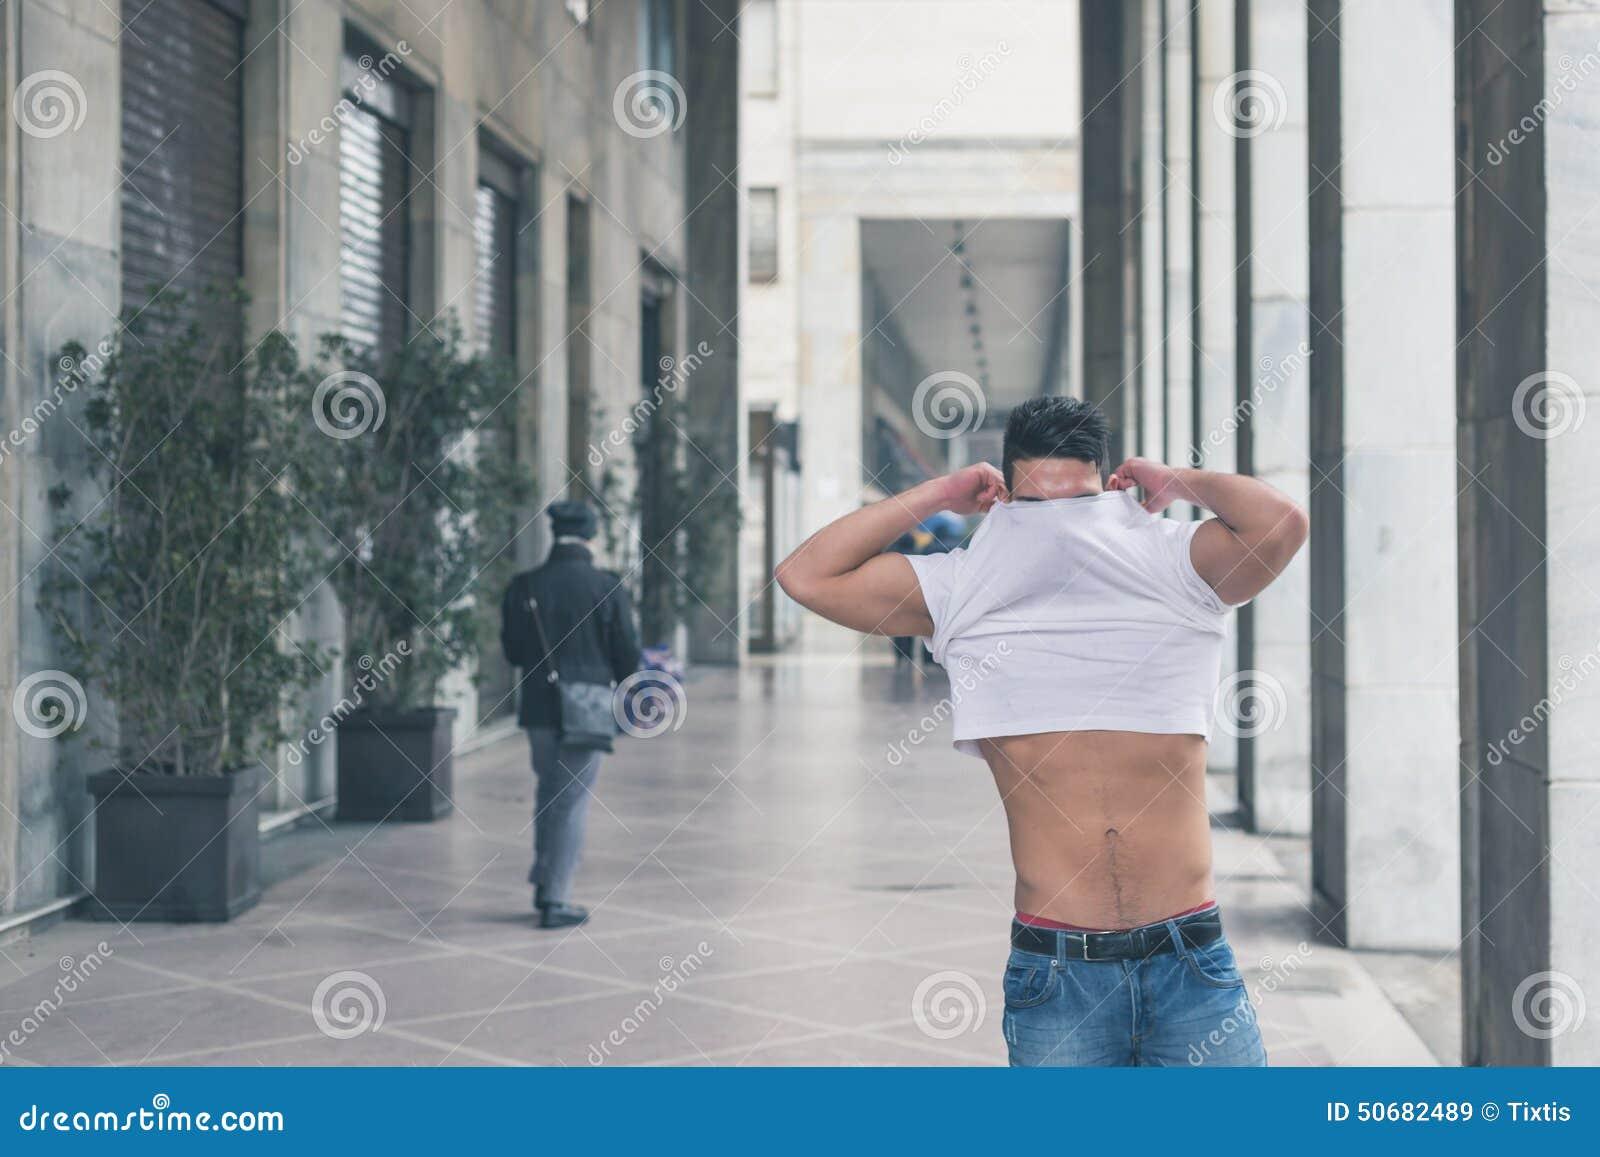 Download 摆在城市街道的年轻英俊的人 库存图片. 图片 包括有 人员, 纵向, 男朋友, 摆在, 短小, 现代, 深深 - 50682489